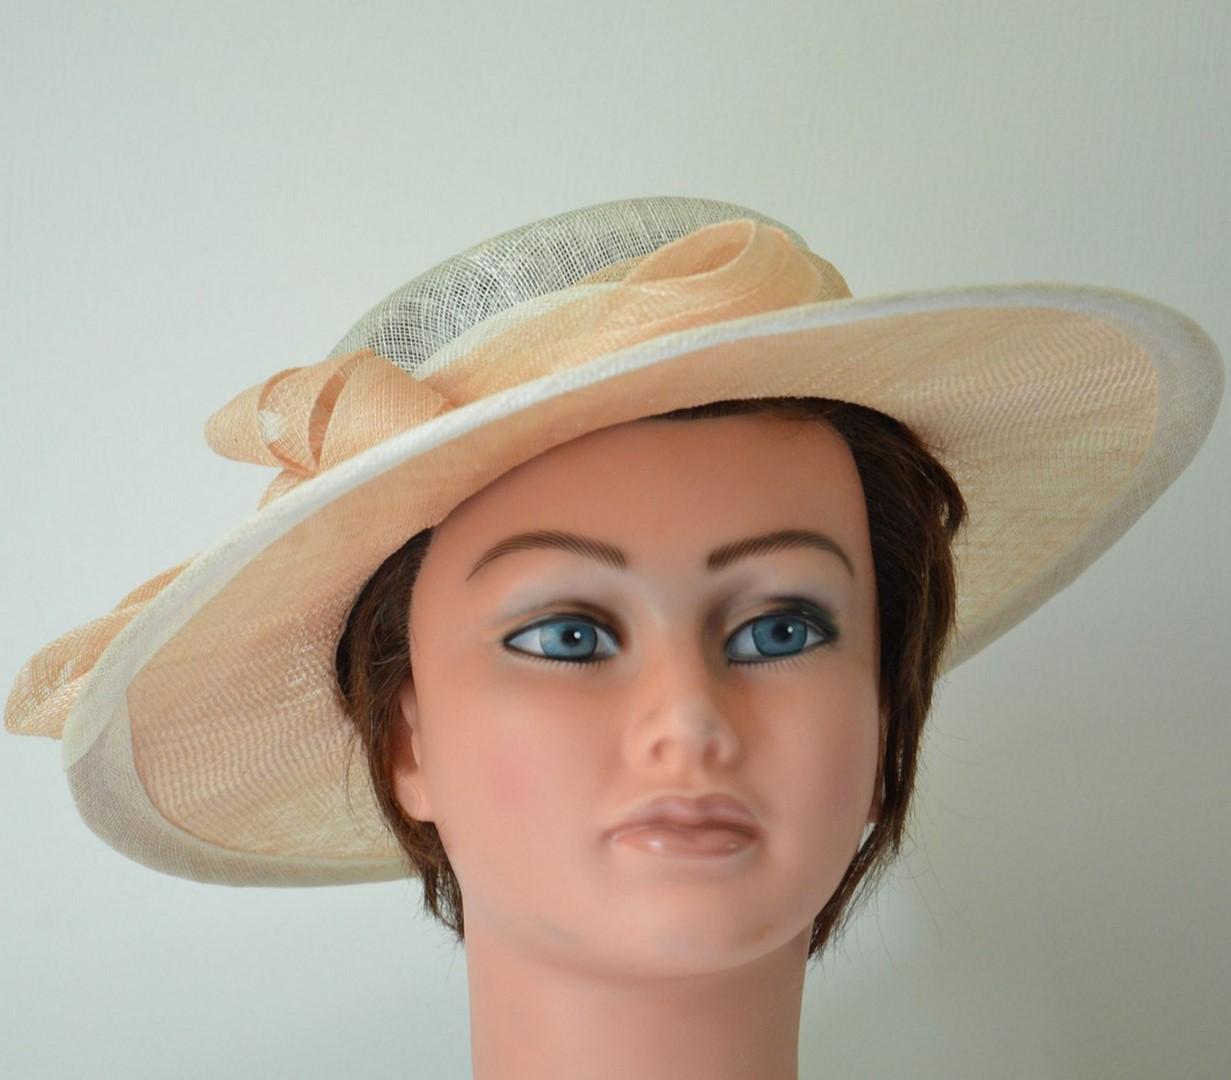 canotier-chapeau-sisal-ercu-rosepoudre-chic-mariage